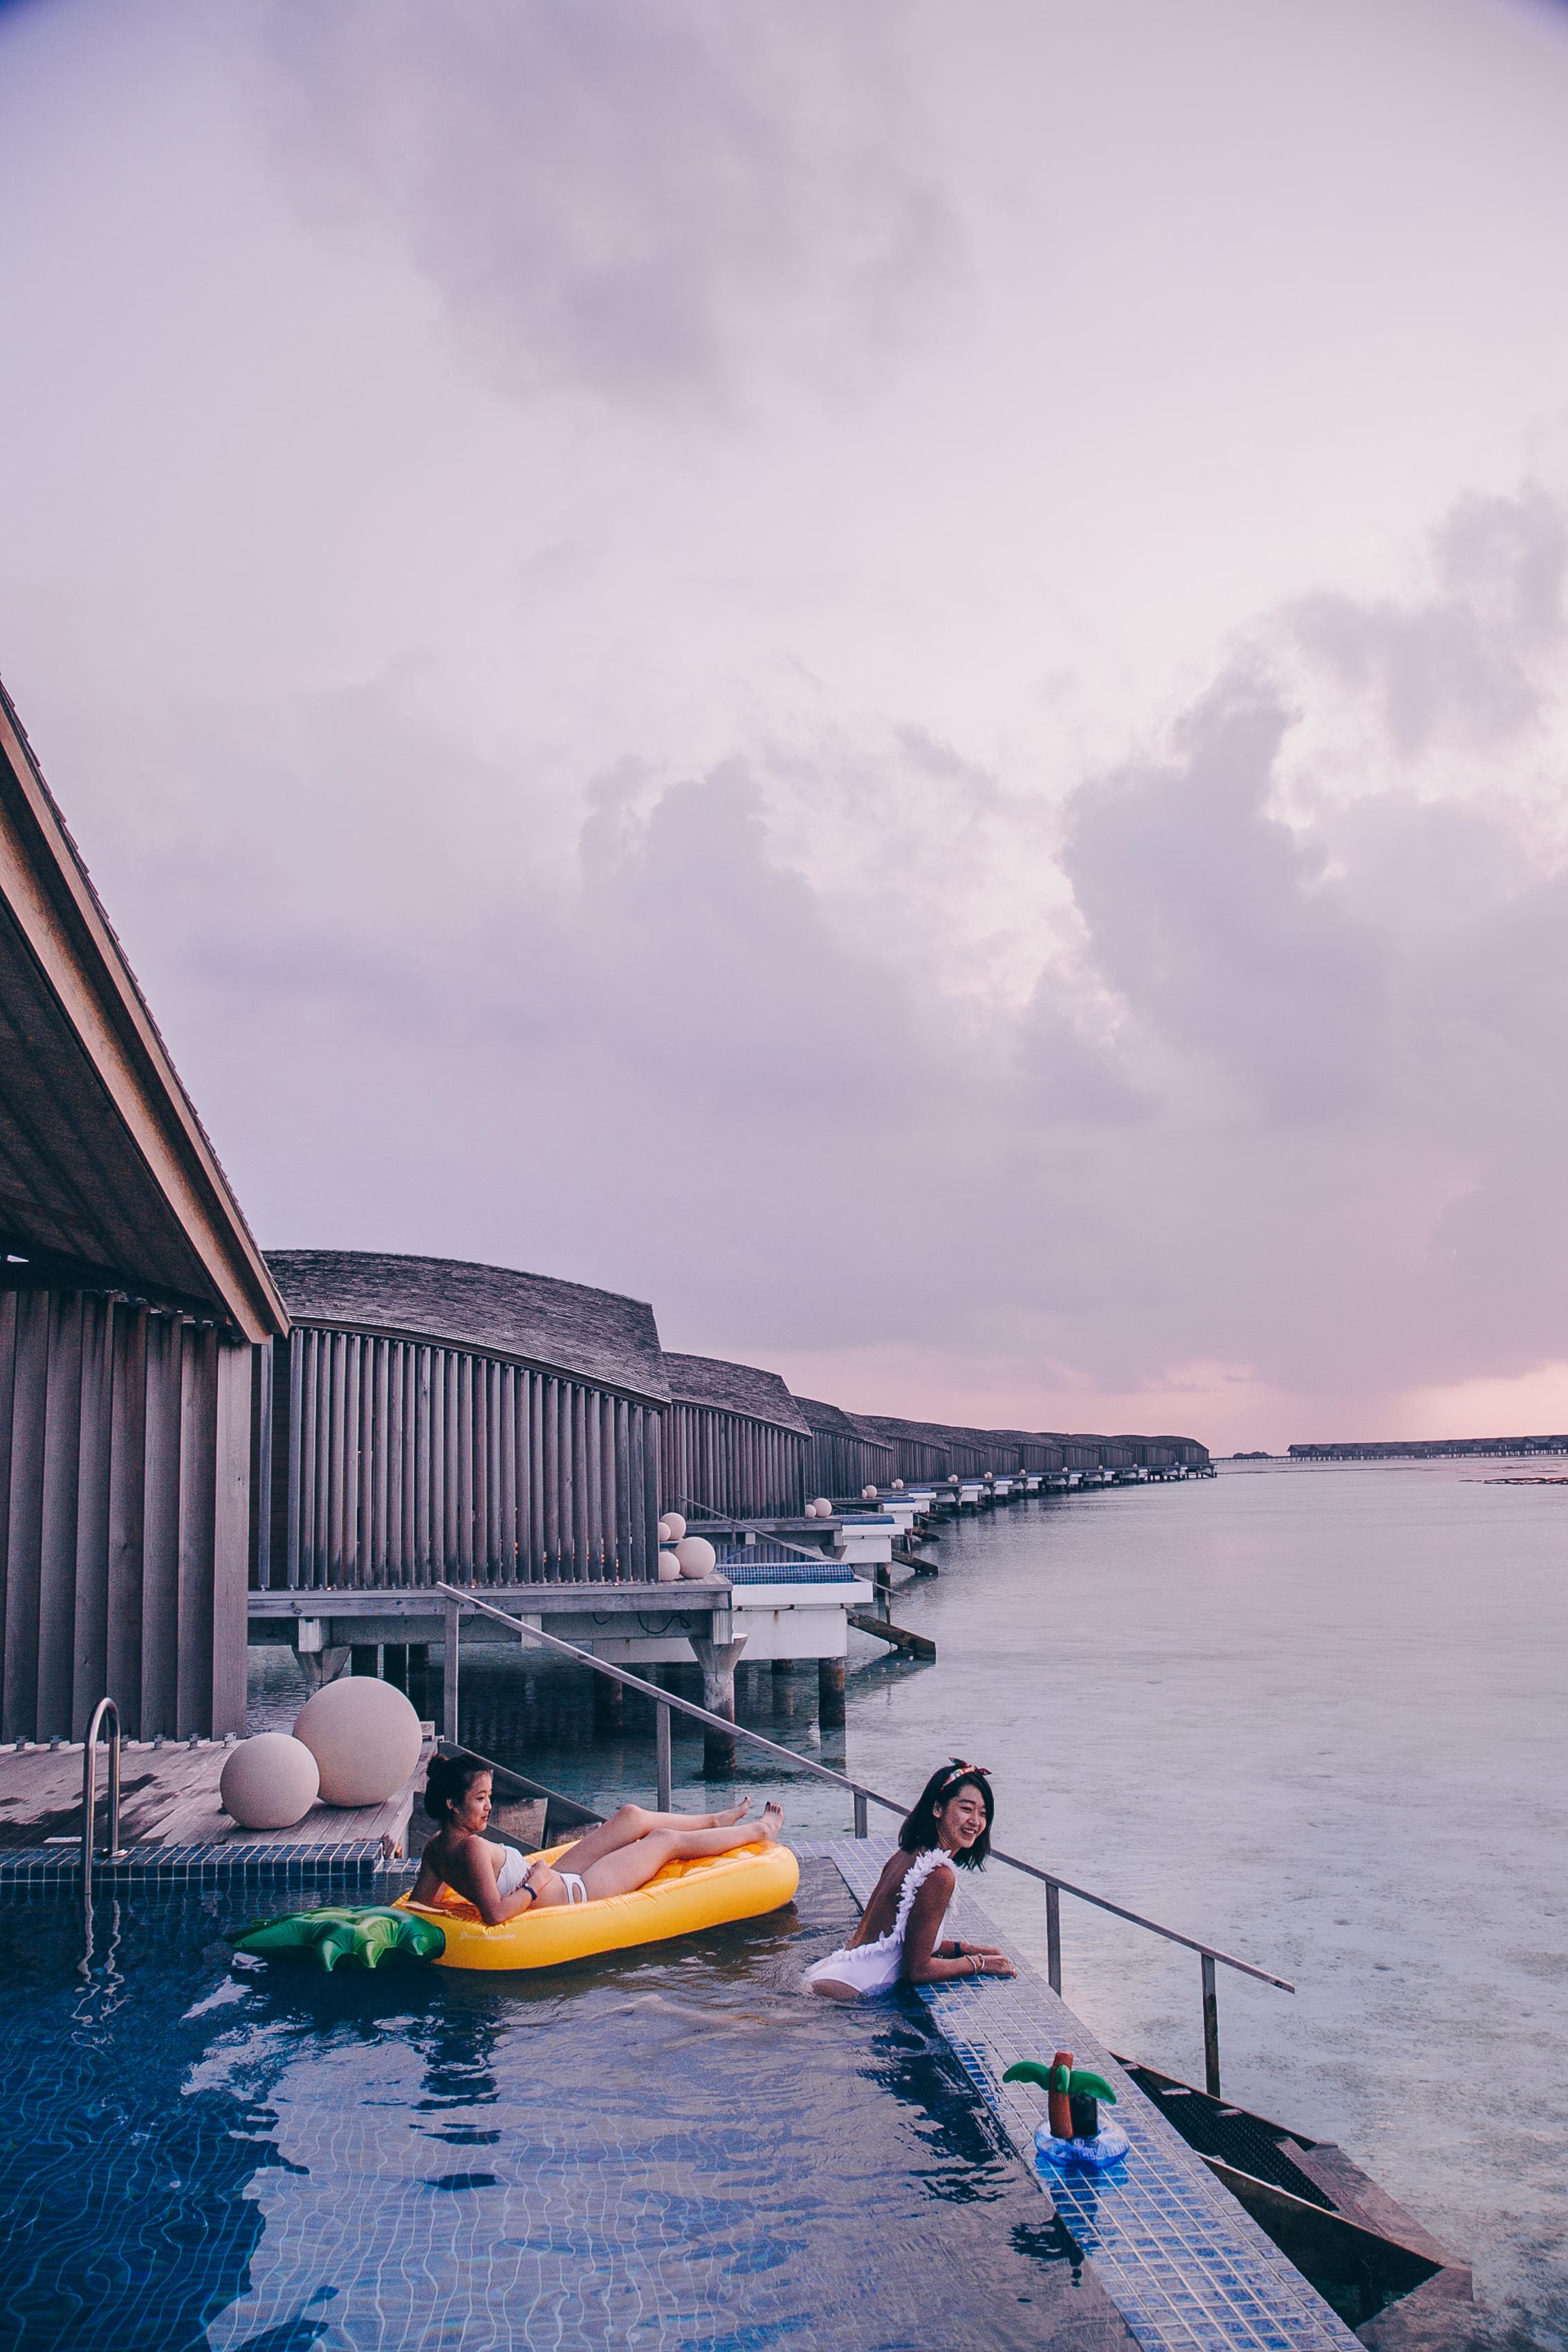 Maldives_Jan18_Lichipan-82.jpg